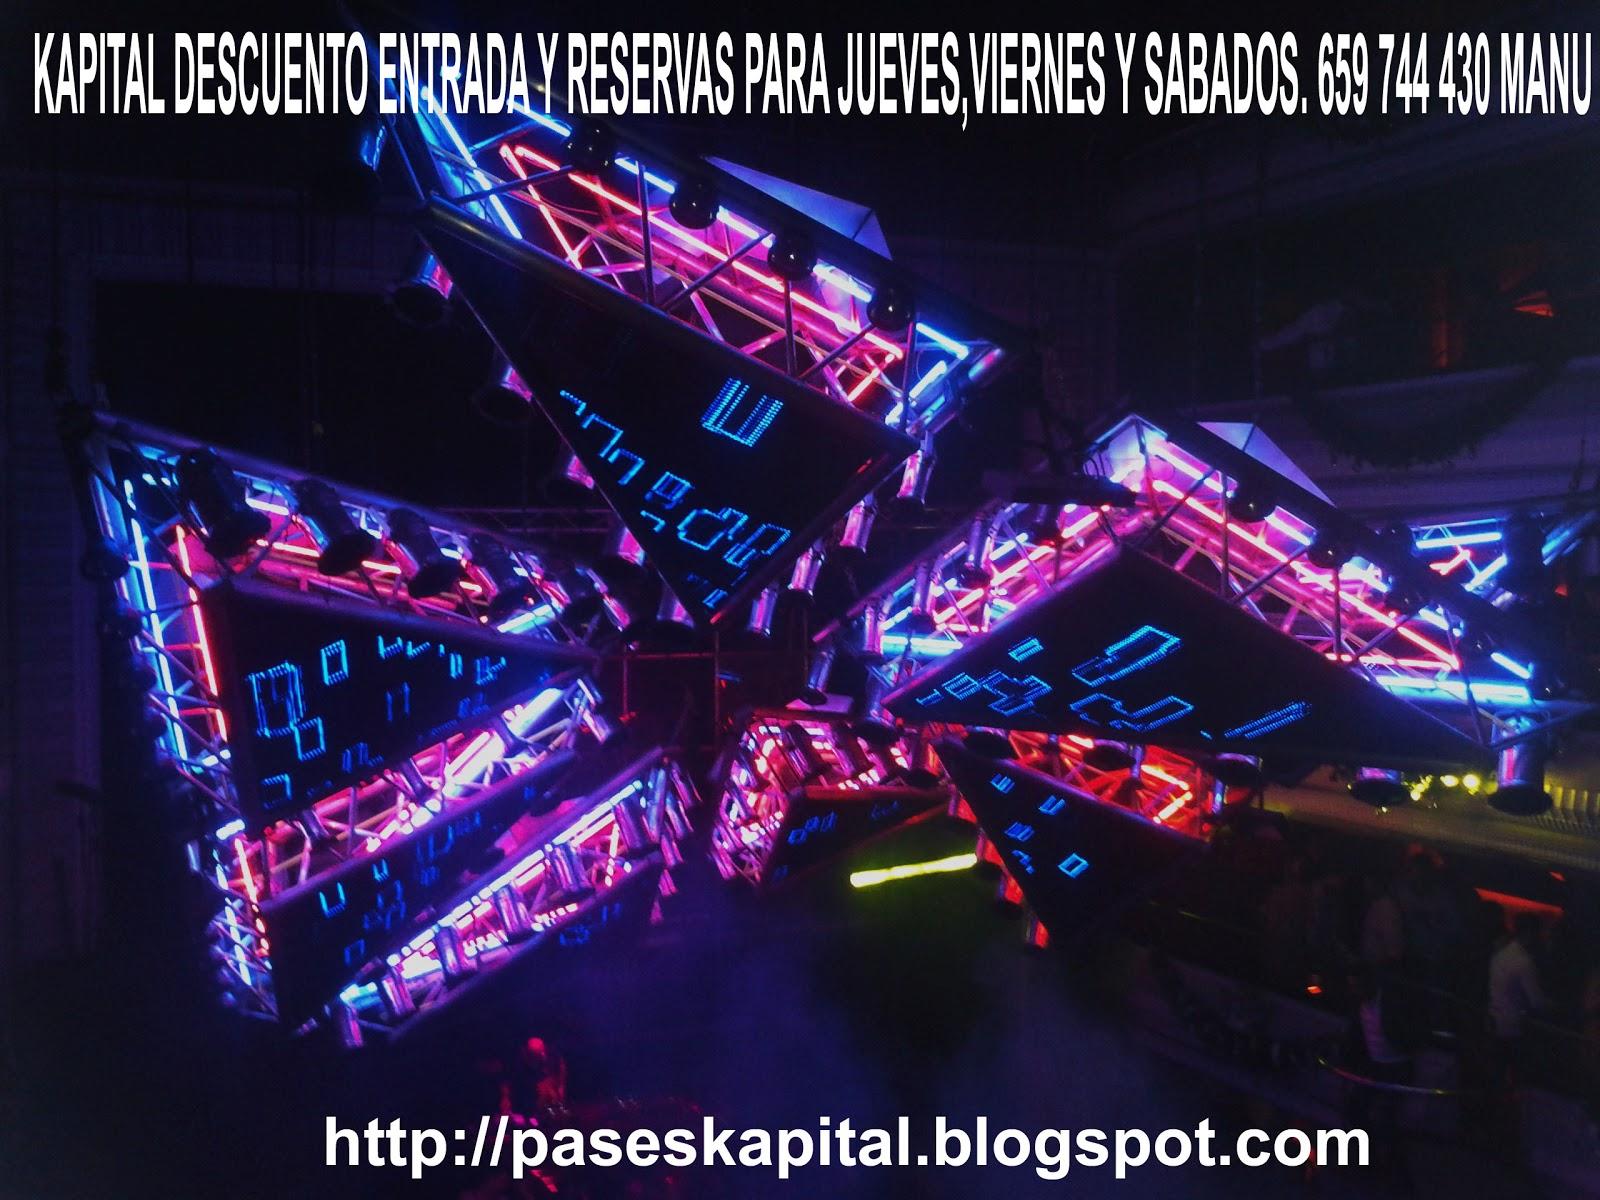 Discotecas gratis madrid 659 74 44 30 whatsapp reserva de for Kapital jueves gratis